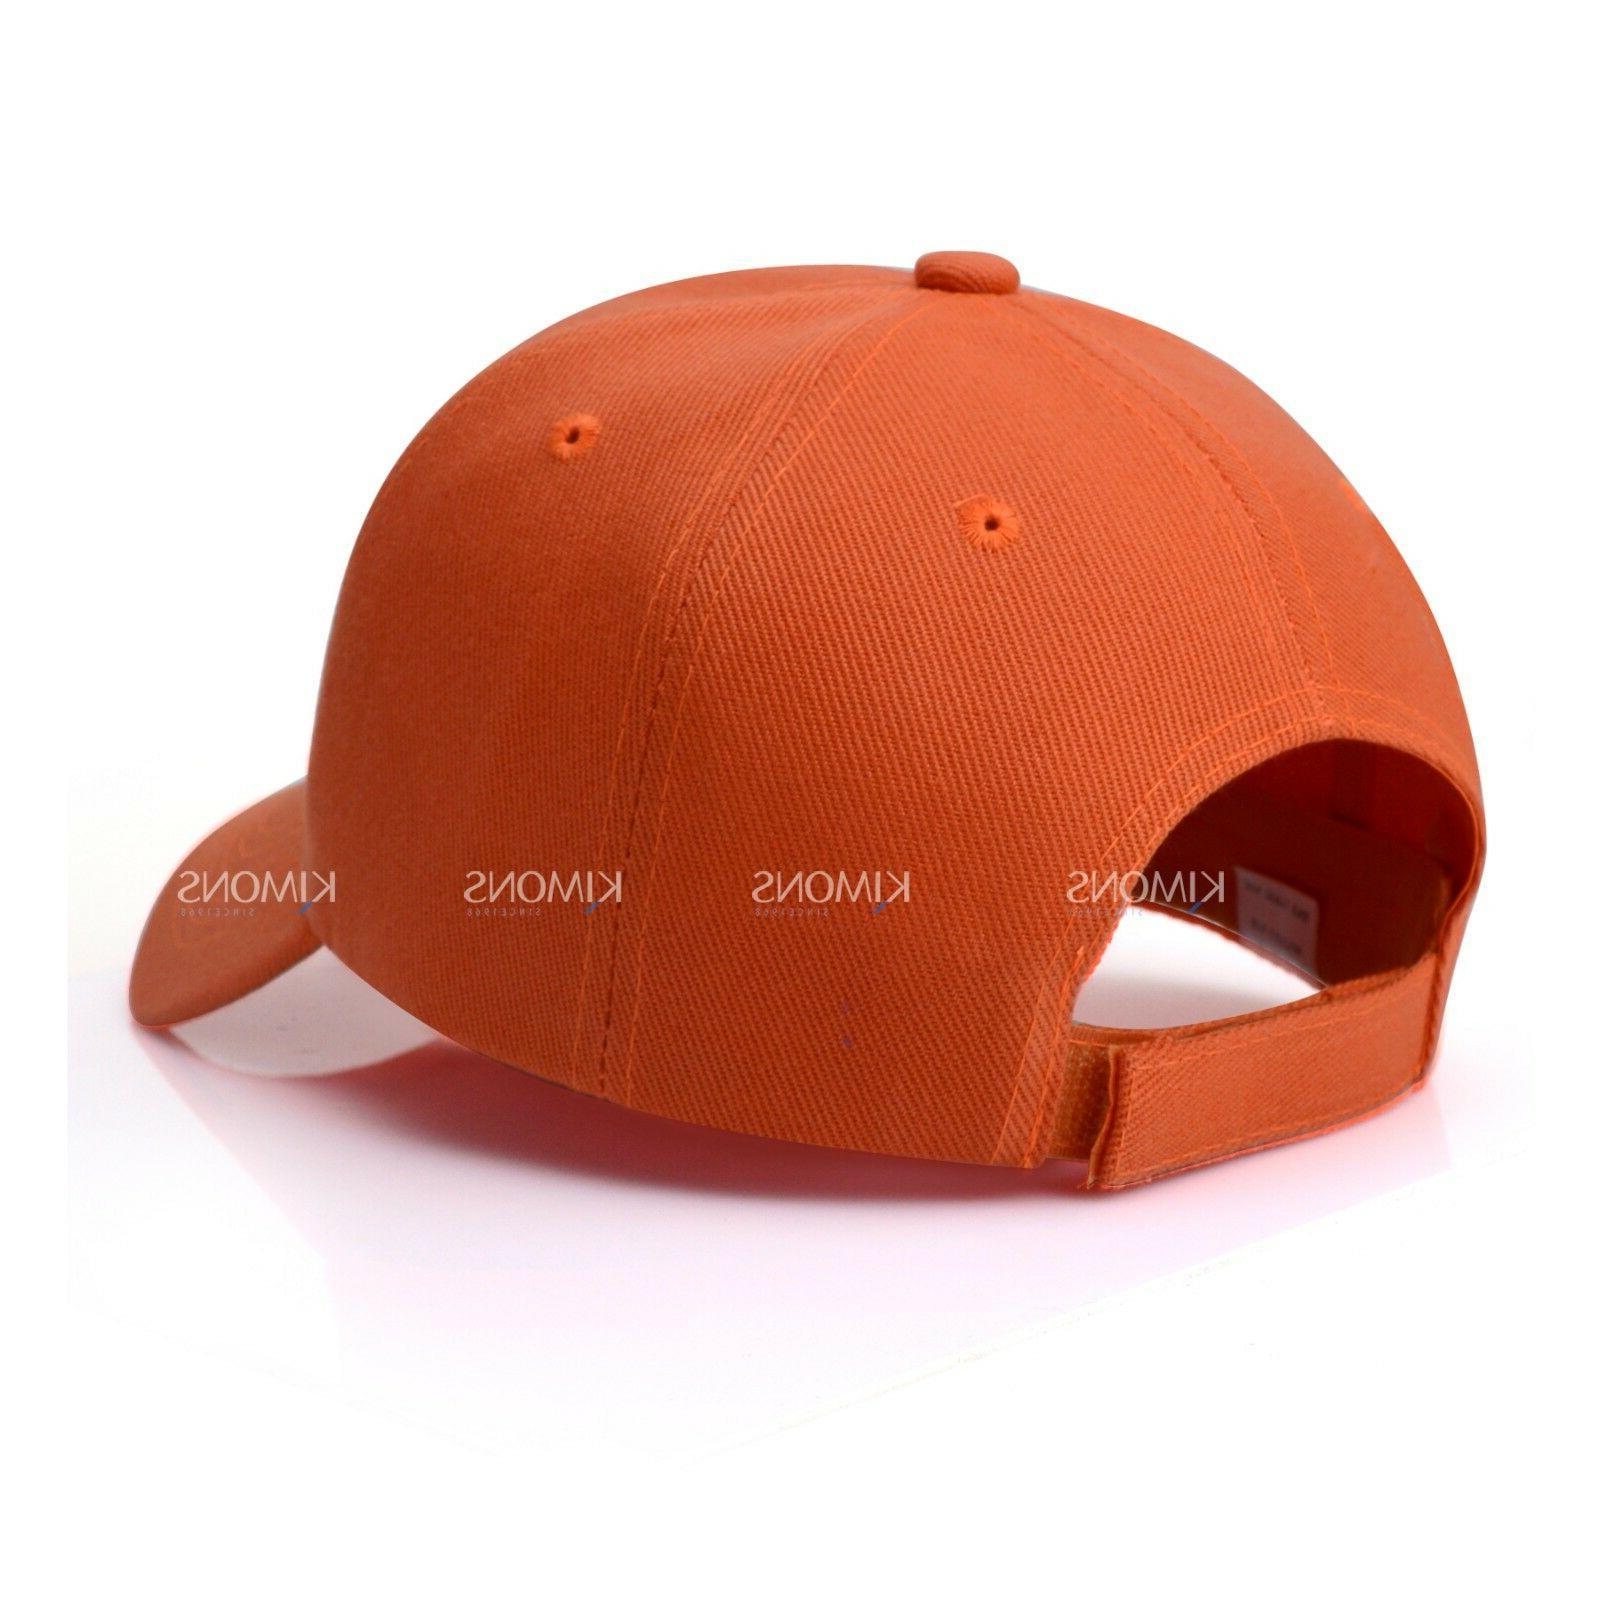 ef52e8cf67909 Loop Solid Color Curved Visor Hat Adjustable Army Mens